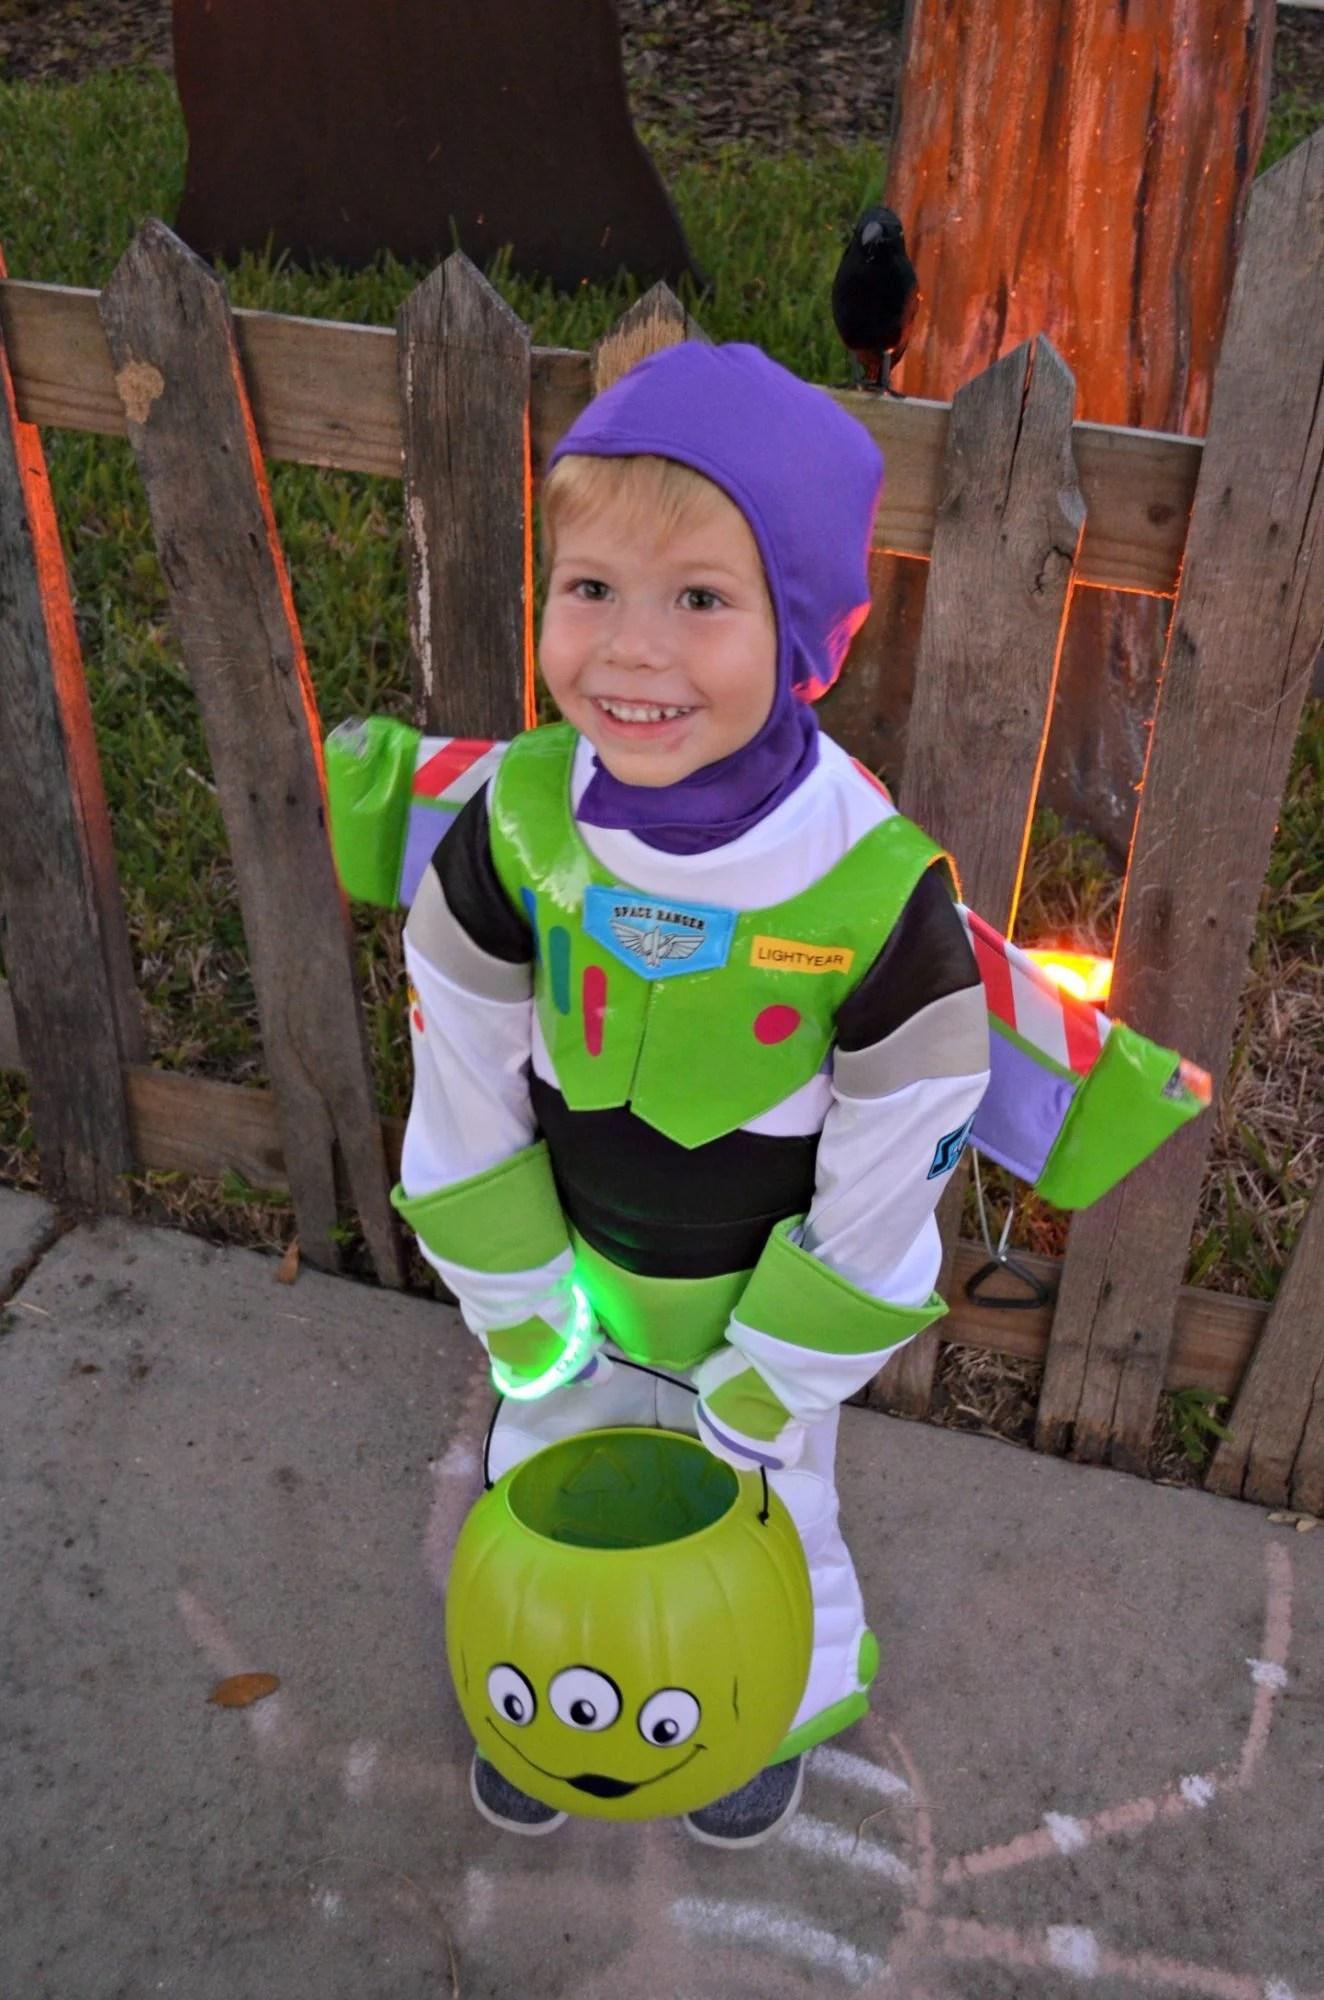 Buzz Lightyear Costume with Alien Trick or Treat Bucket